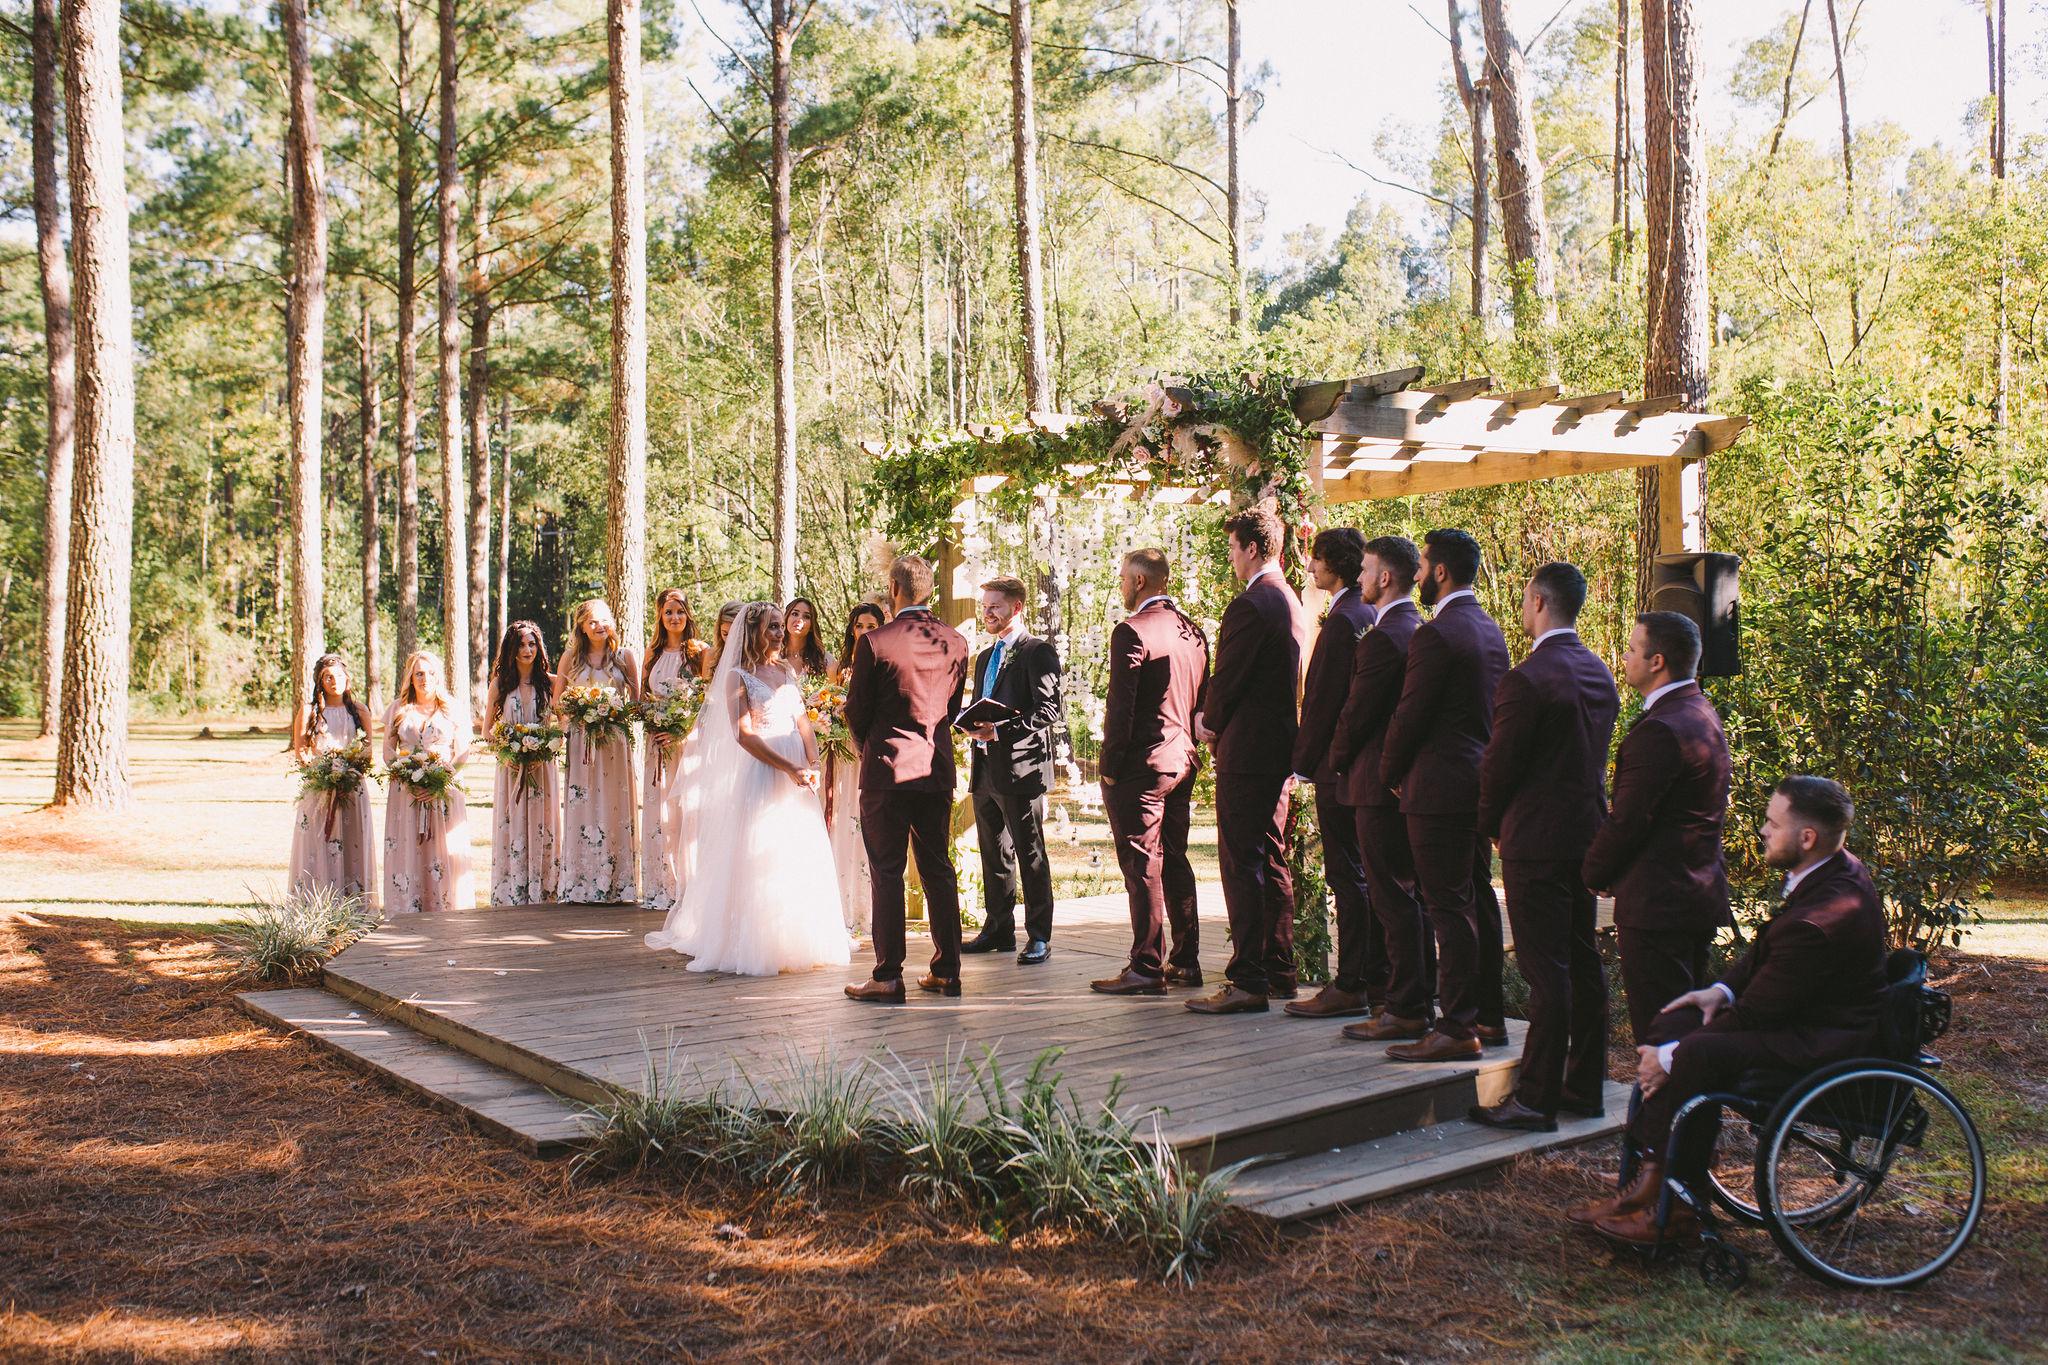 Jesseandlex_181103_AlexisNate_Wedding_Ceremony_092.jpg